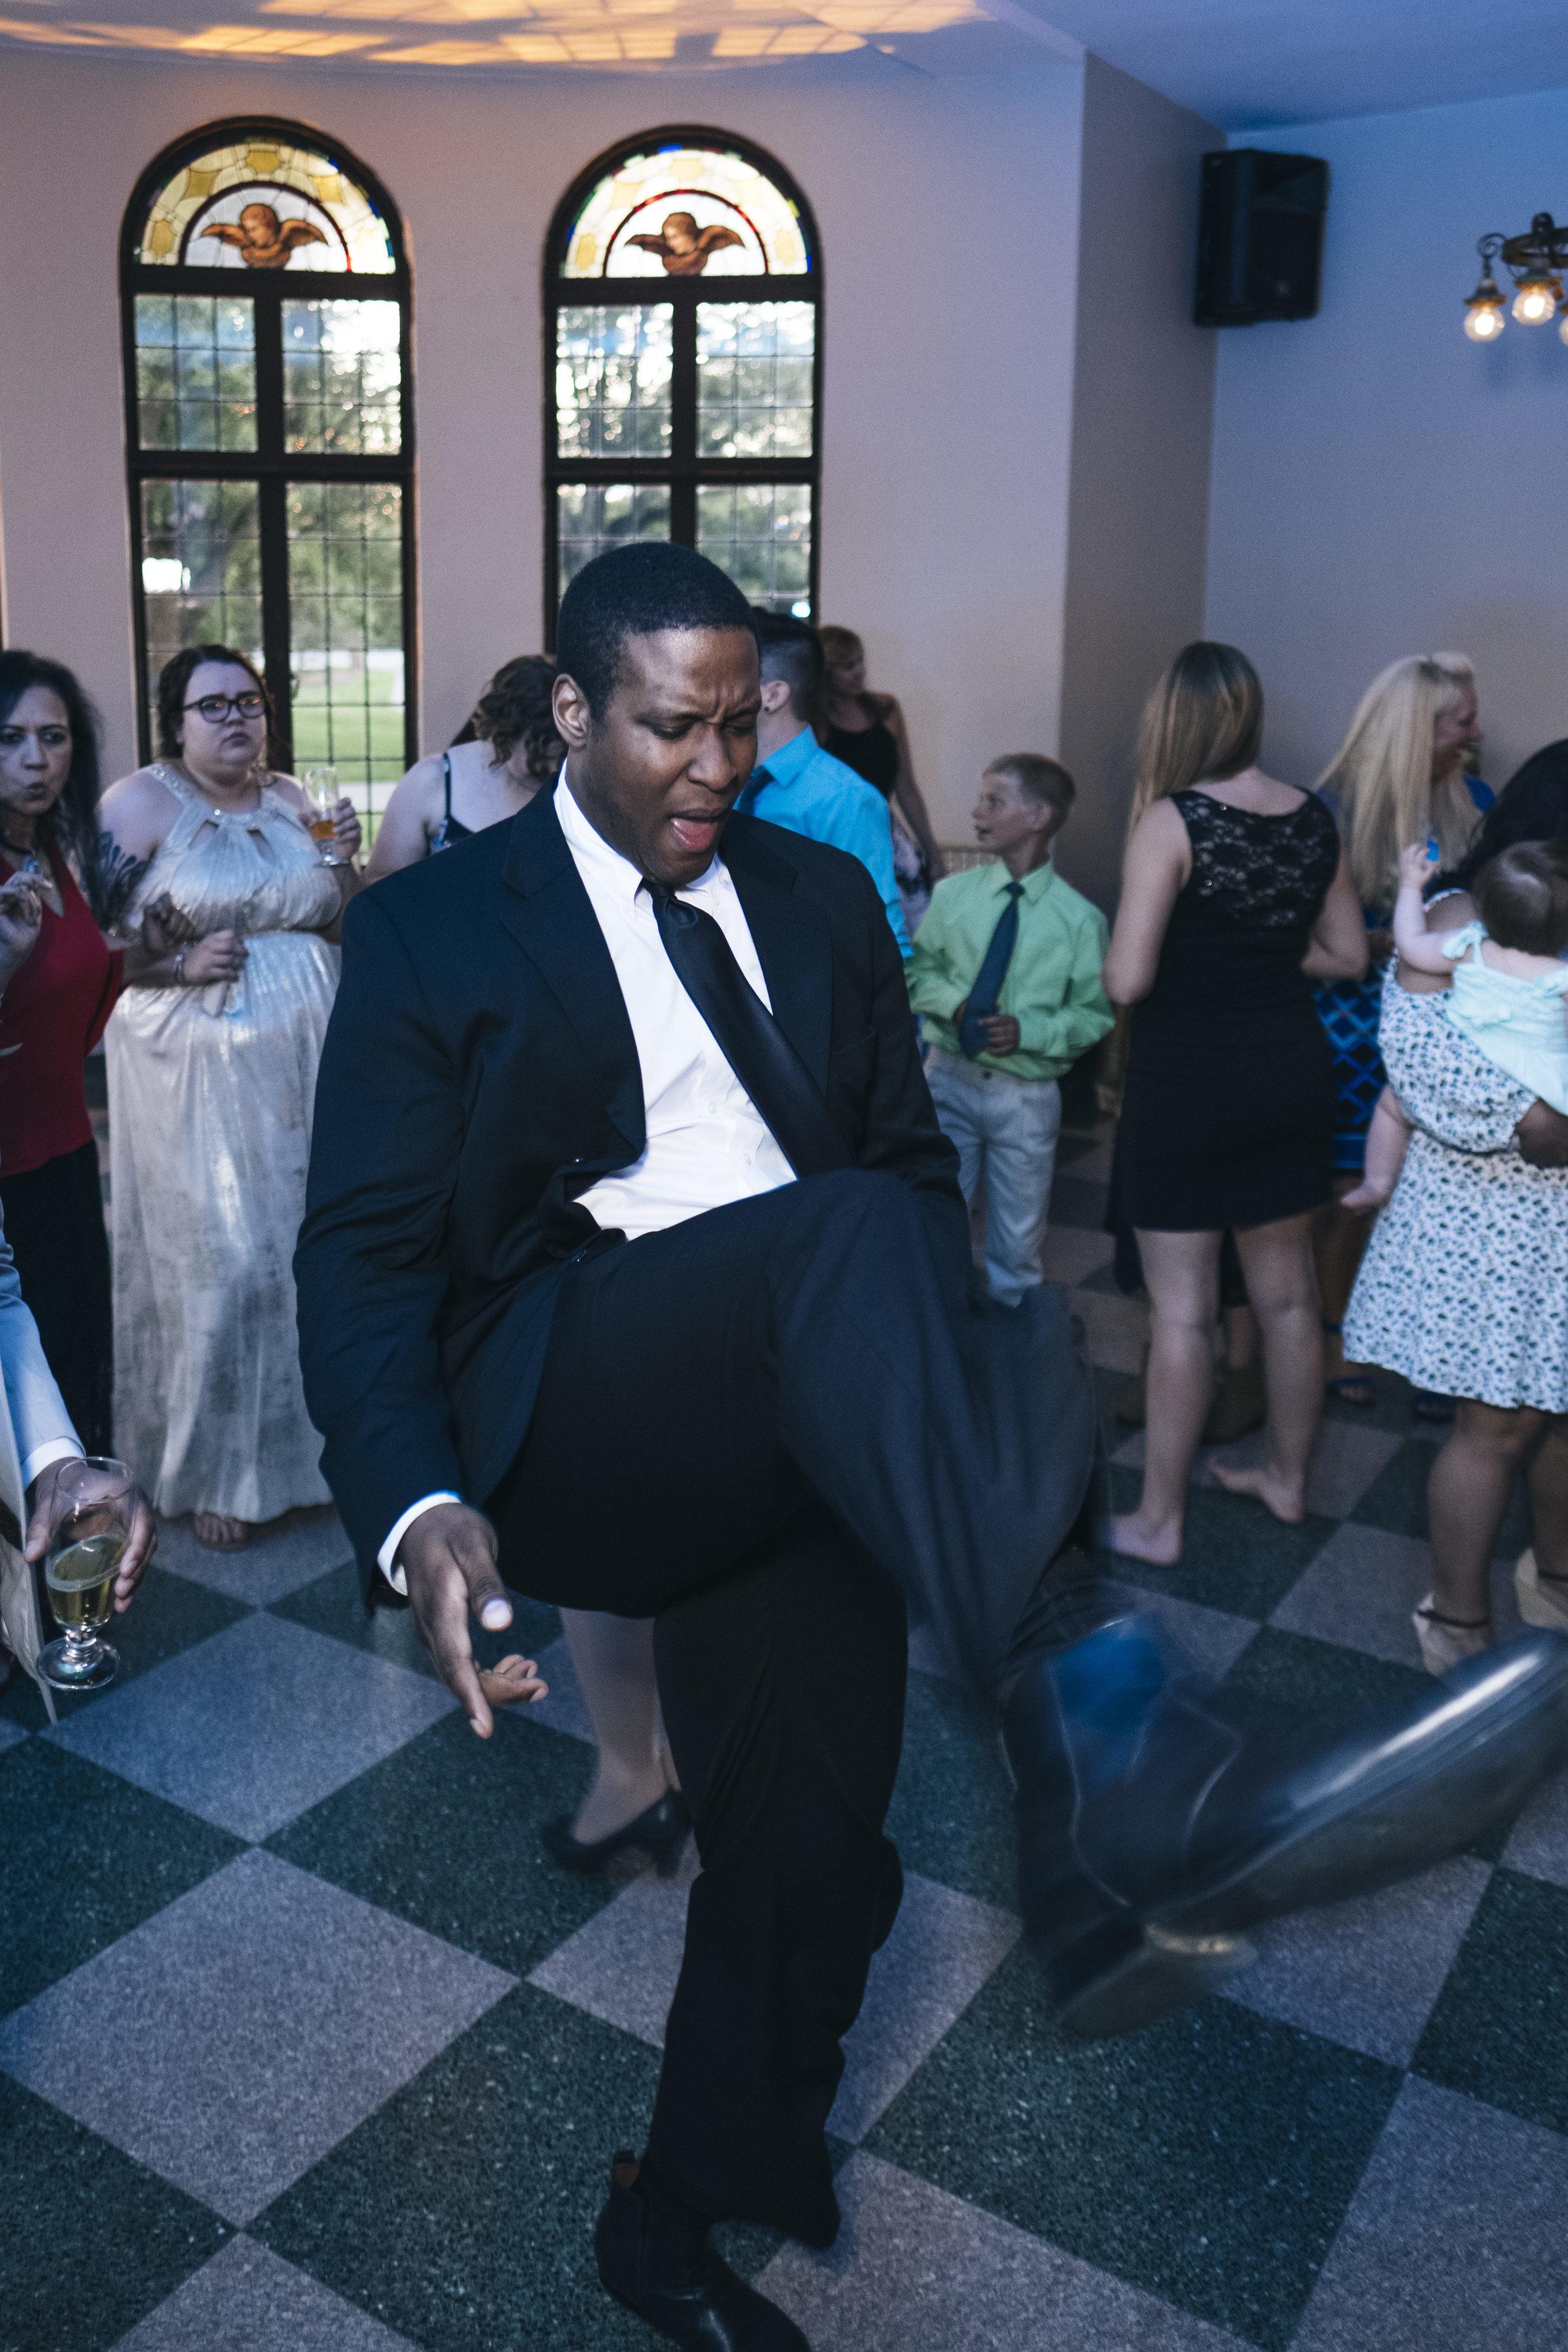 Man dances at a wedding reception in Grand Rapids, Ohio.